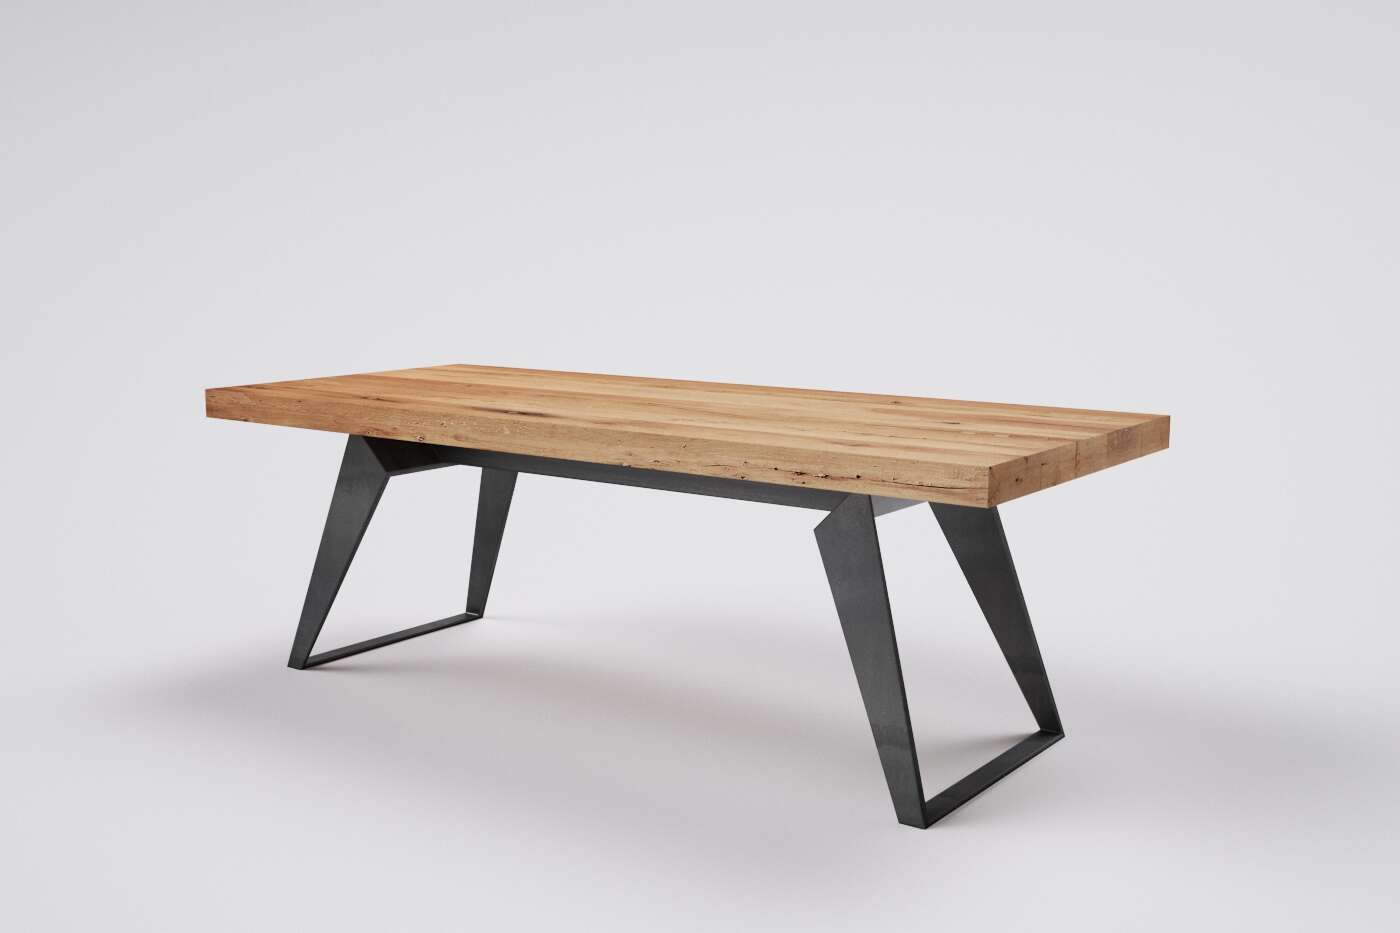 Massivholz Tisch altes Holz Melchior auf Maß